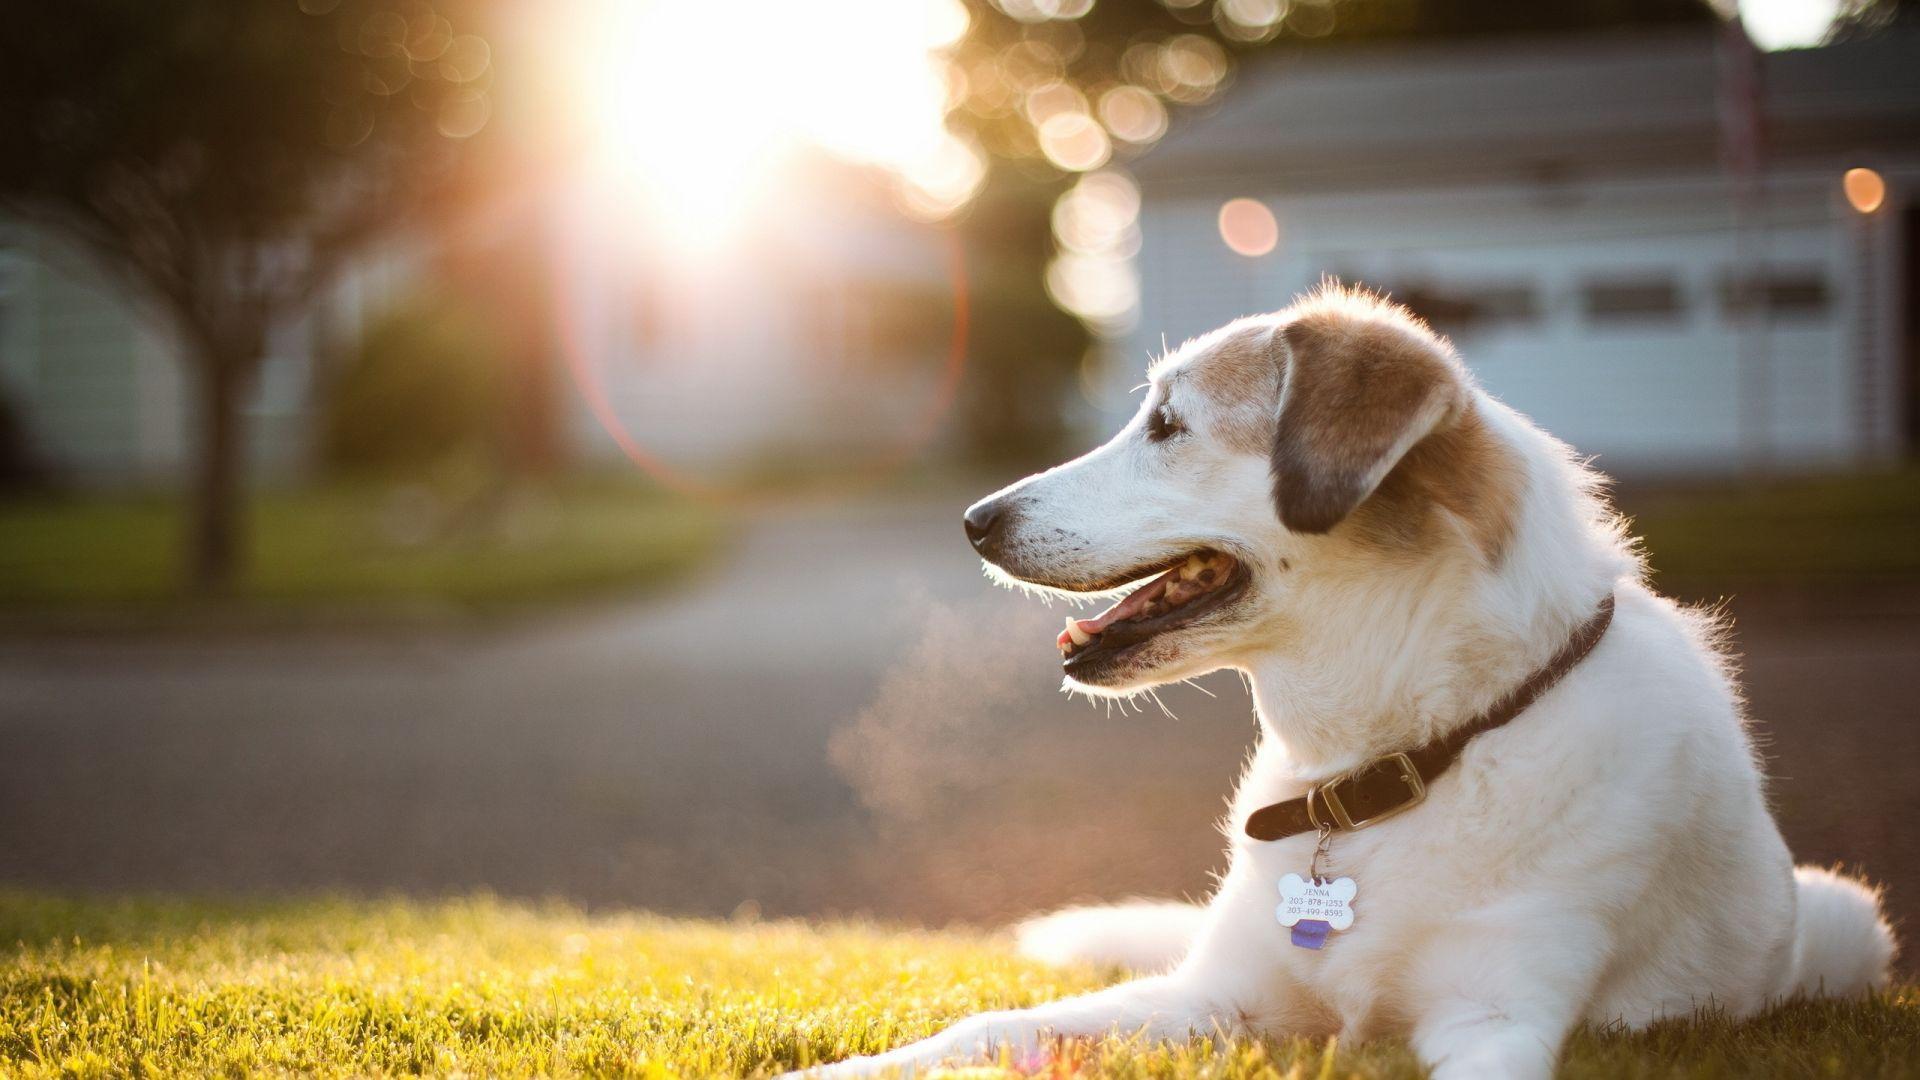 cute dog wallpaper download